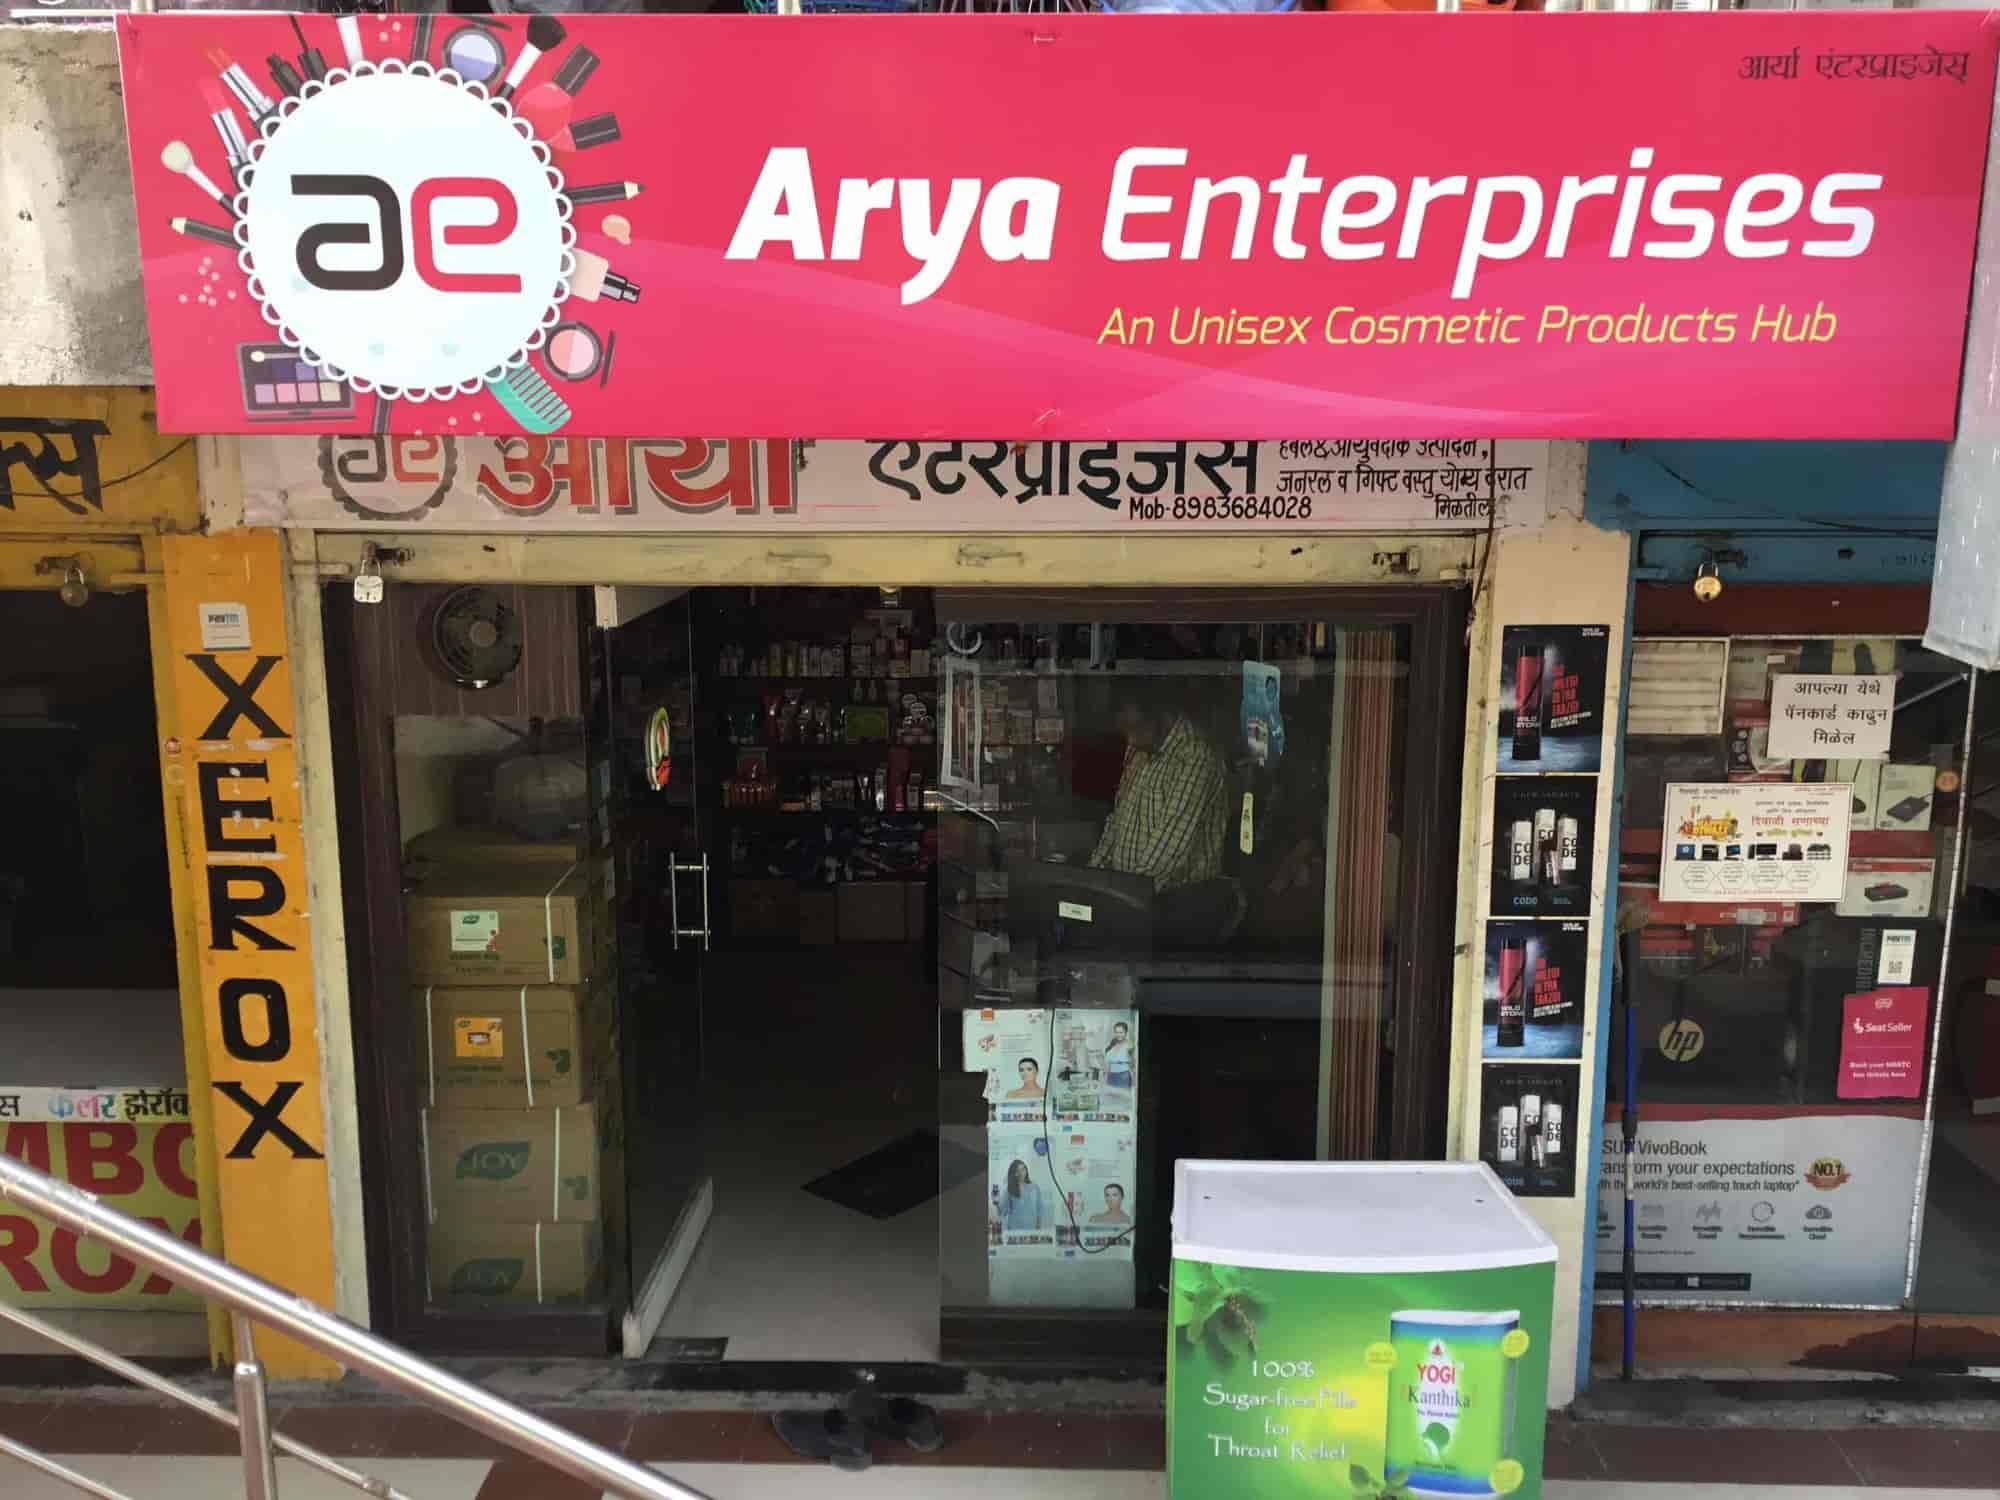 Arya Enterprises Photos, Ashoknagar, Nanded- Pictures